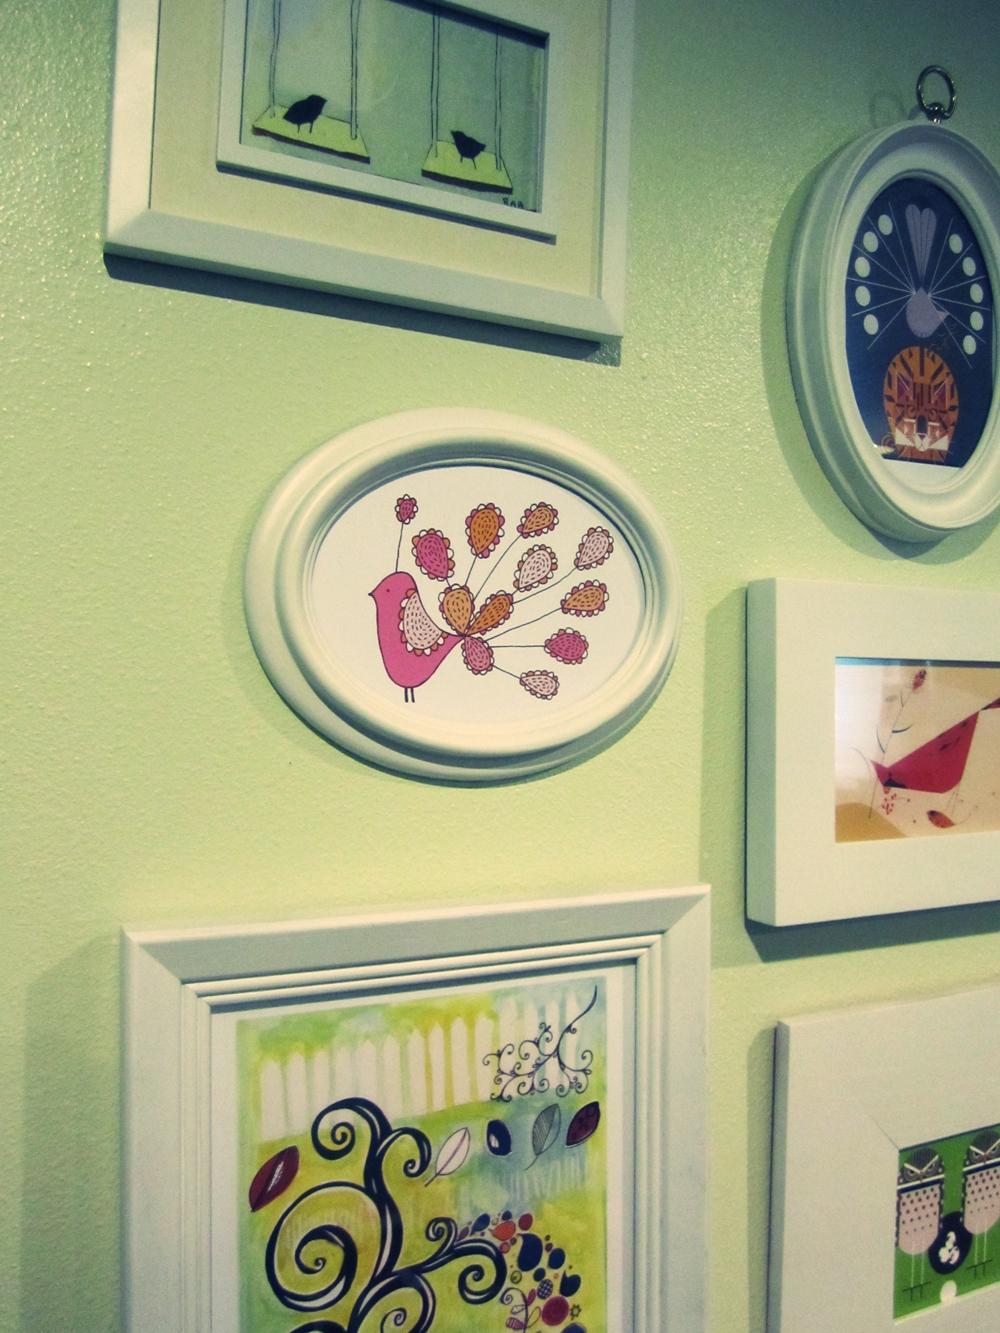 smartgirlstyle: wall art collage